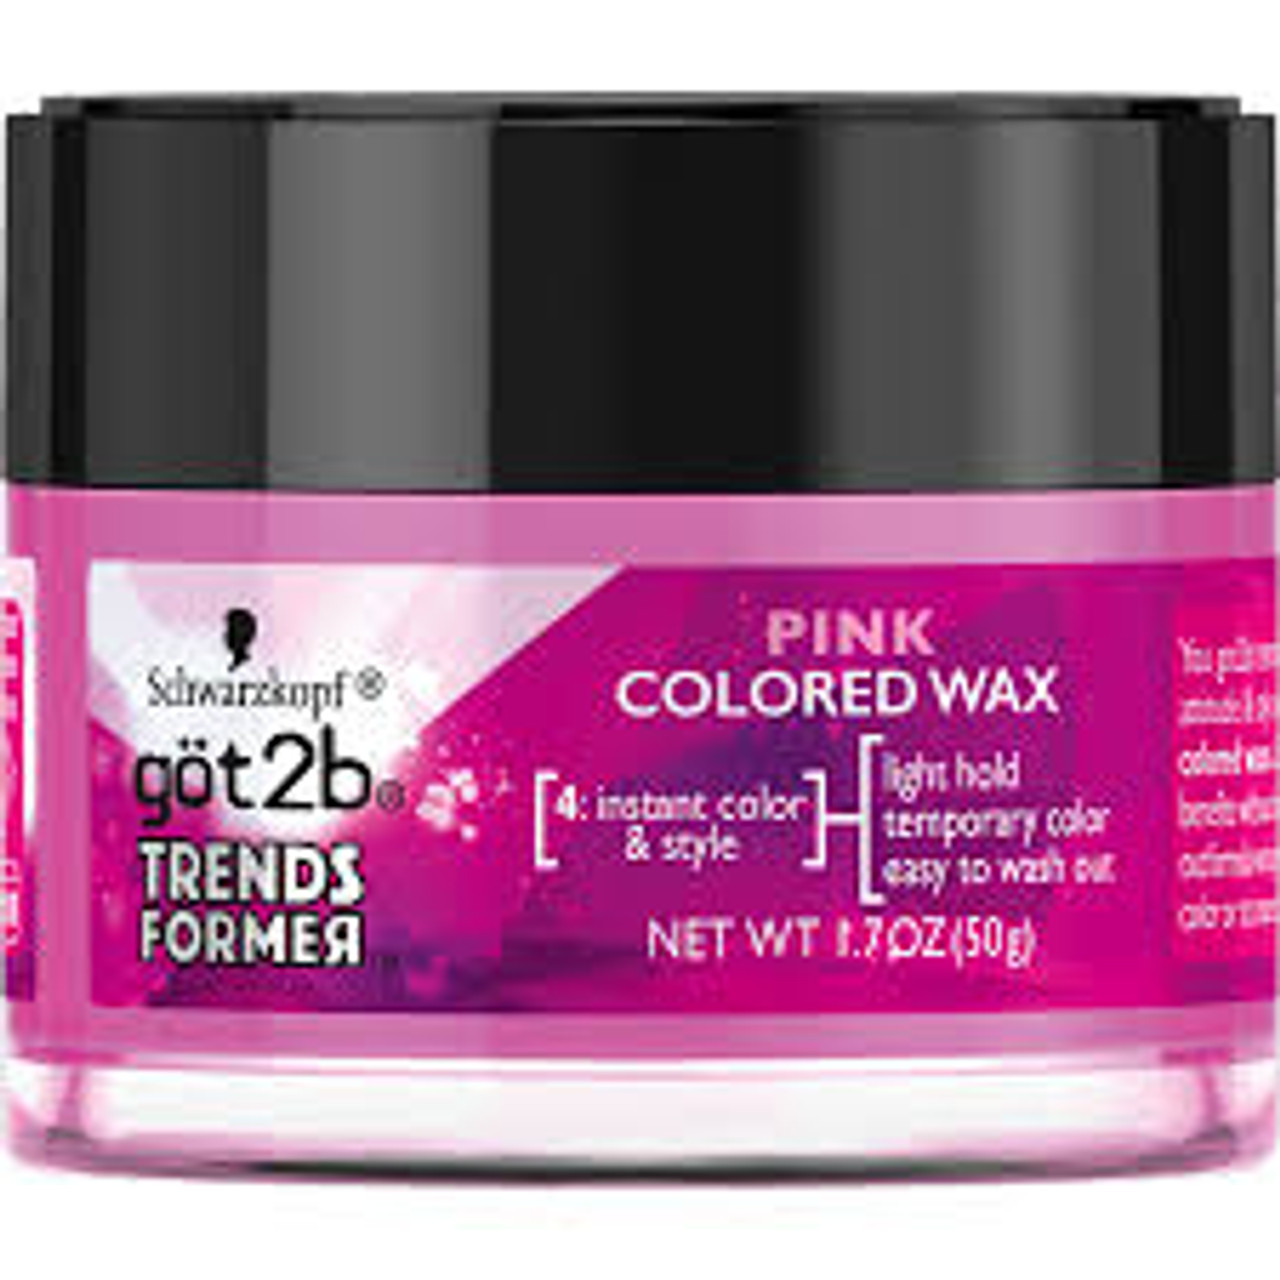 Got2b Trendsformer Temporary Hair Color Wax, Pink, 1.7 oz ...